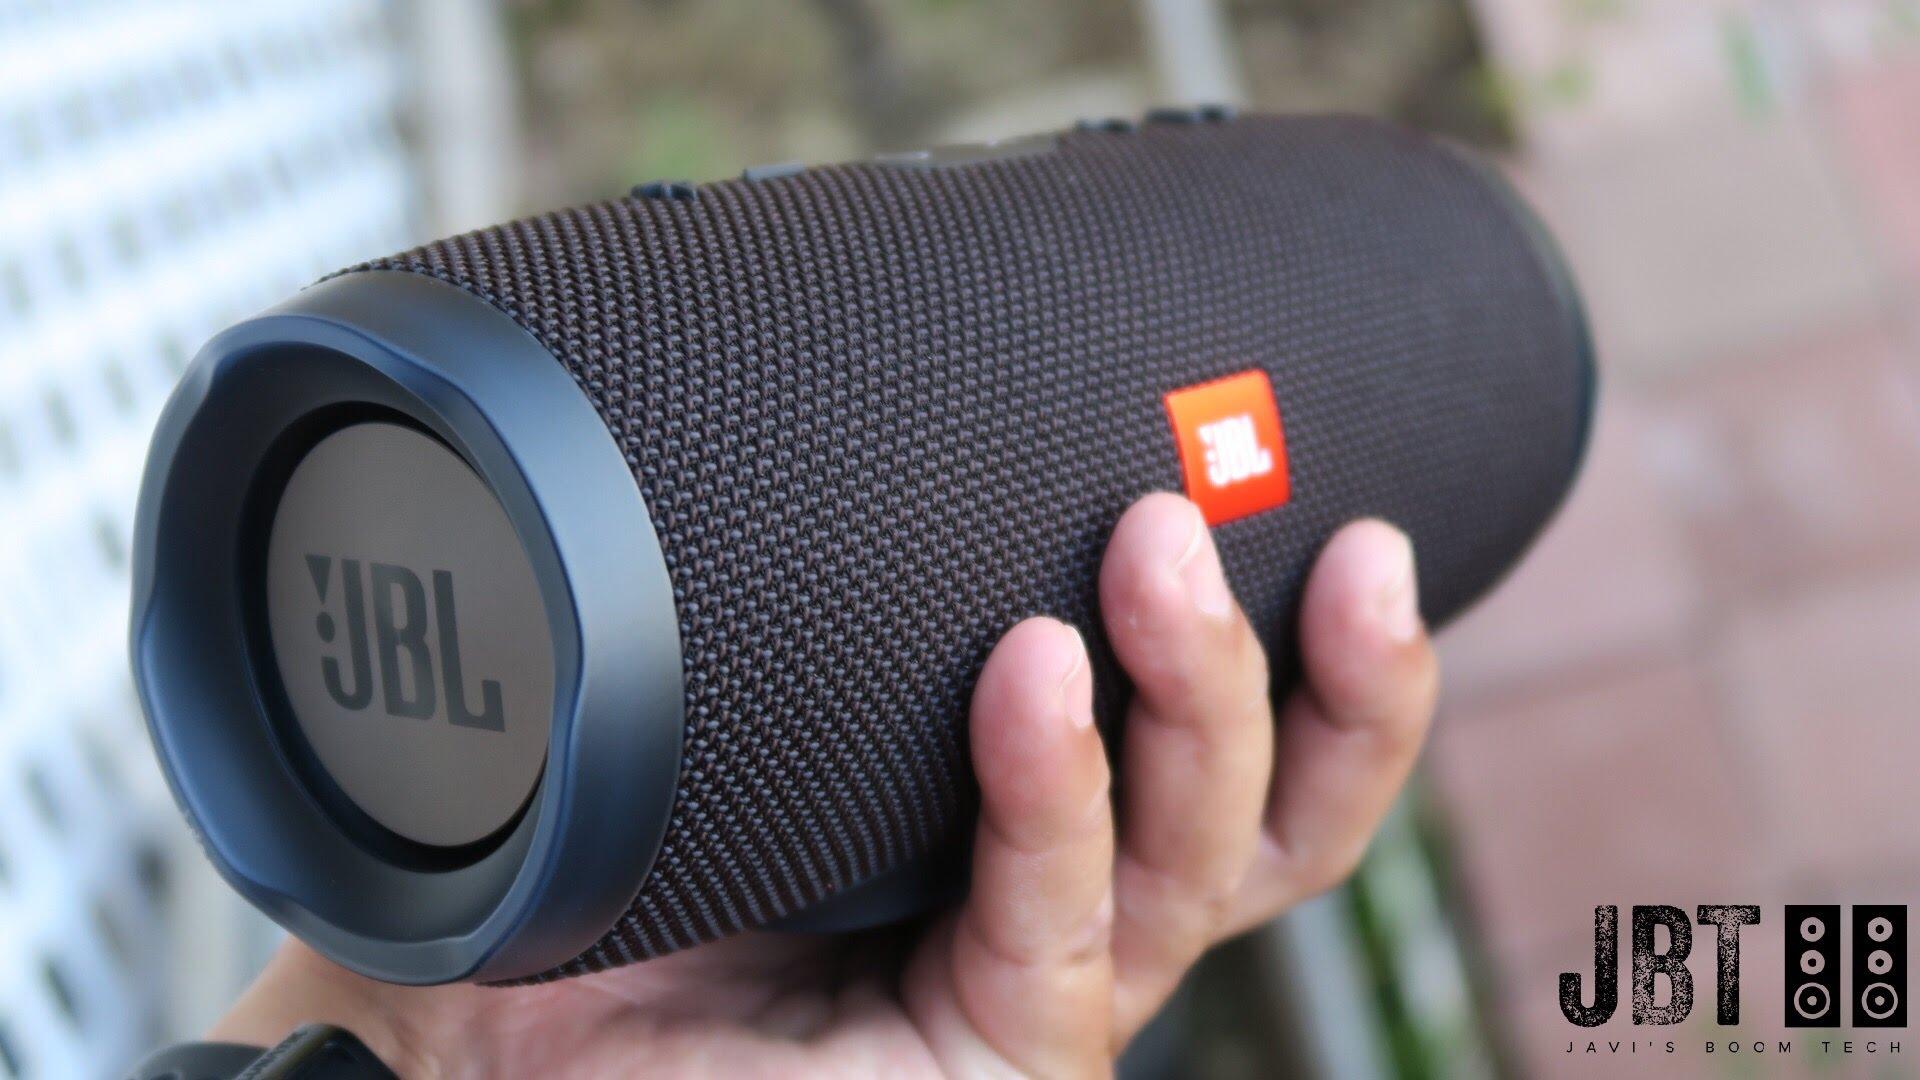 libratone too vs jbl charge 3 bluetooth speakers. Black Bedroom Furniture Sets. Home Design Ideas